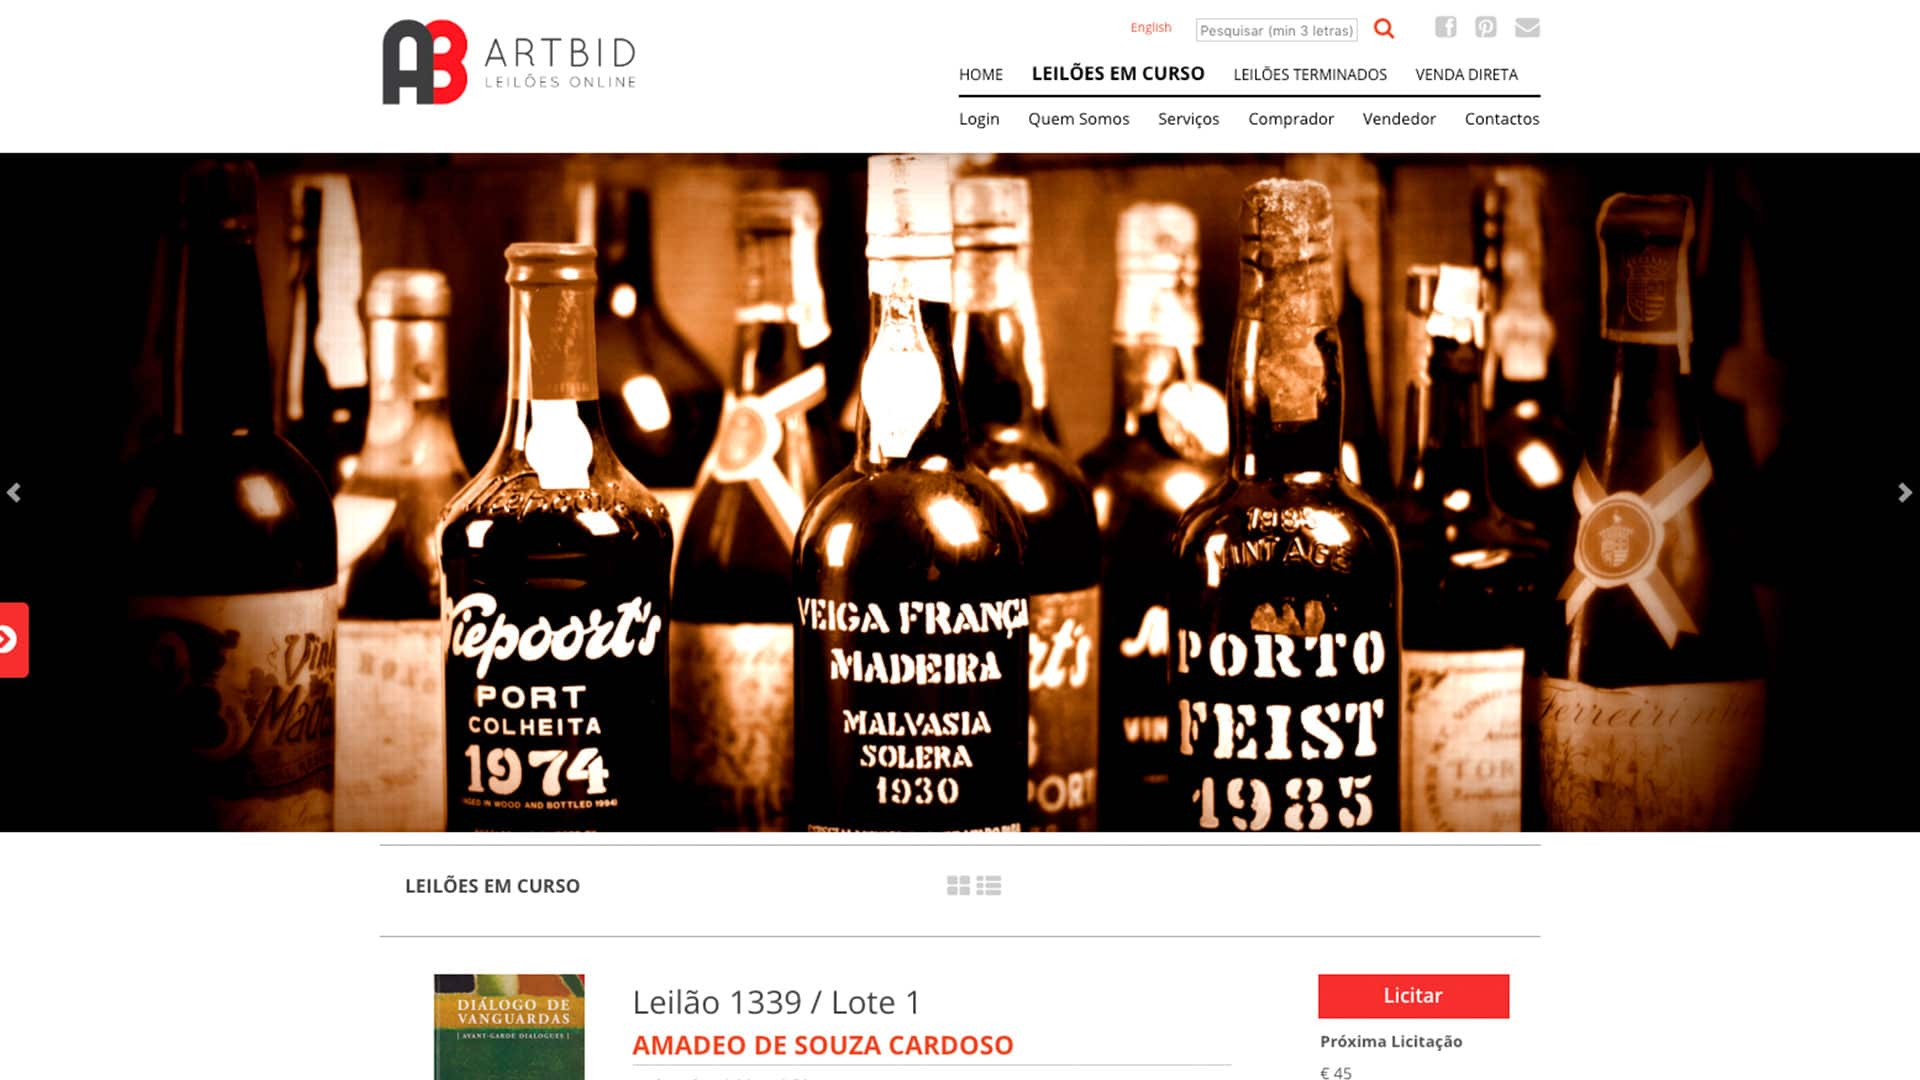 Artbid homepage